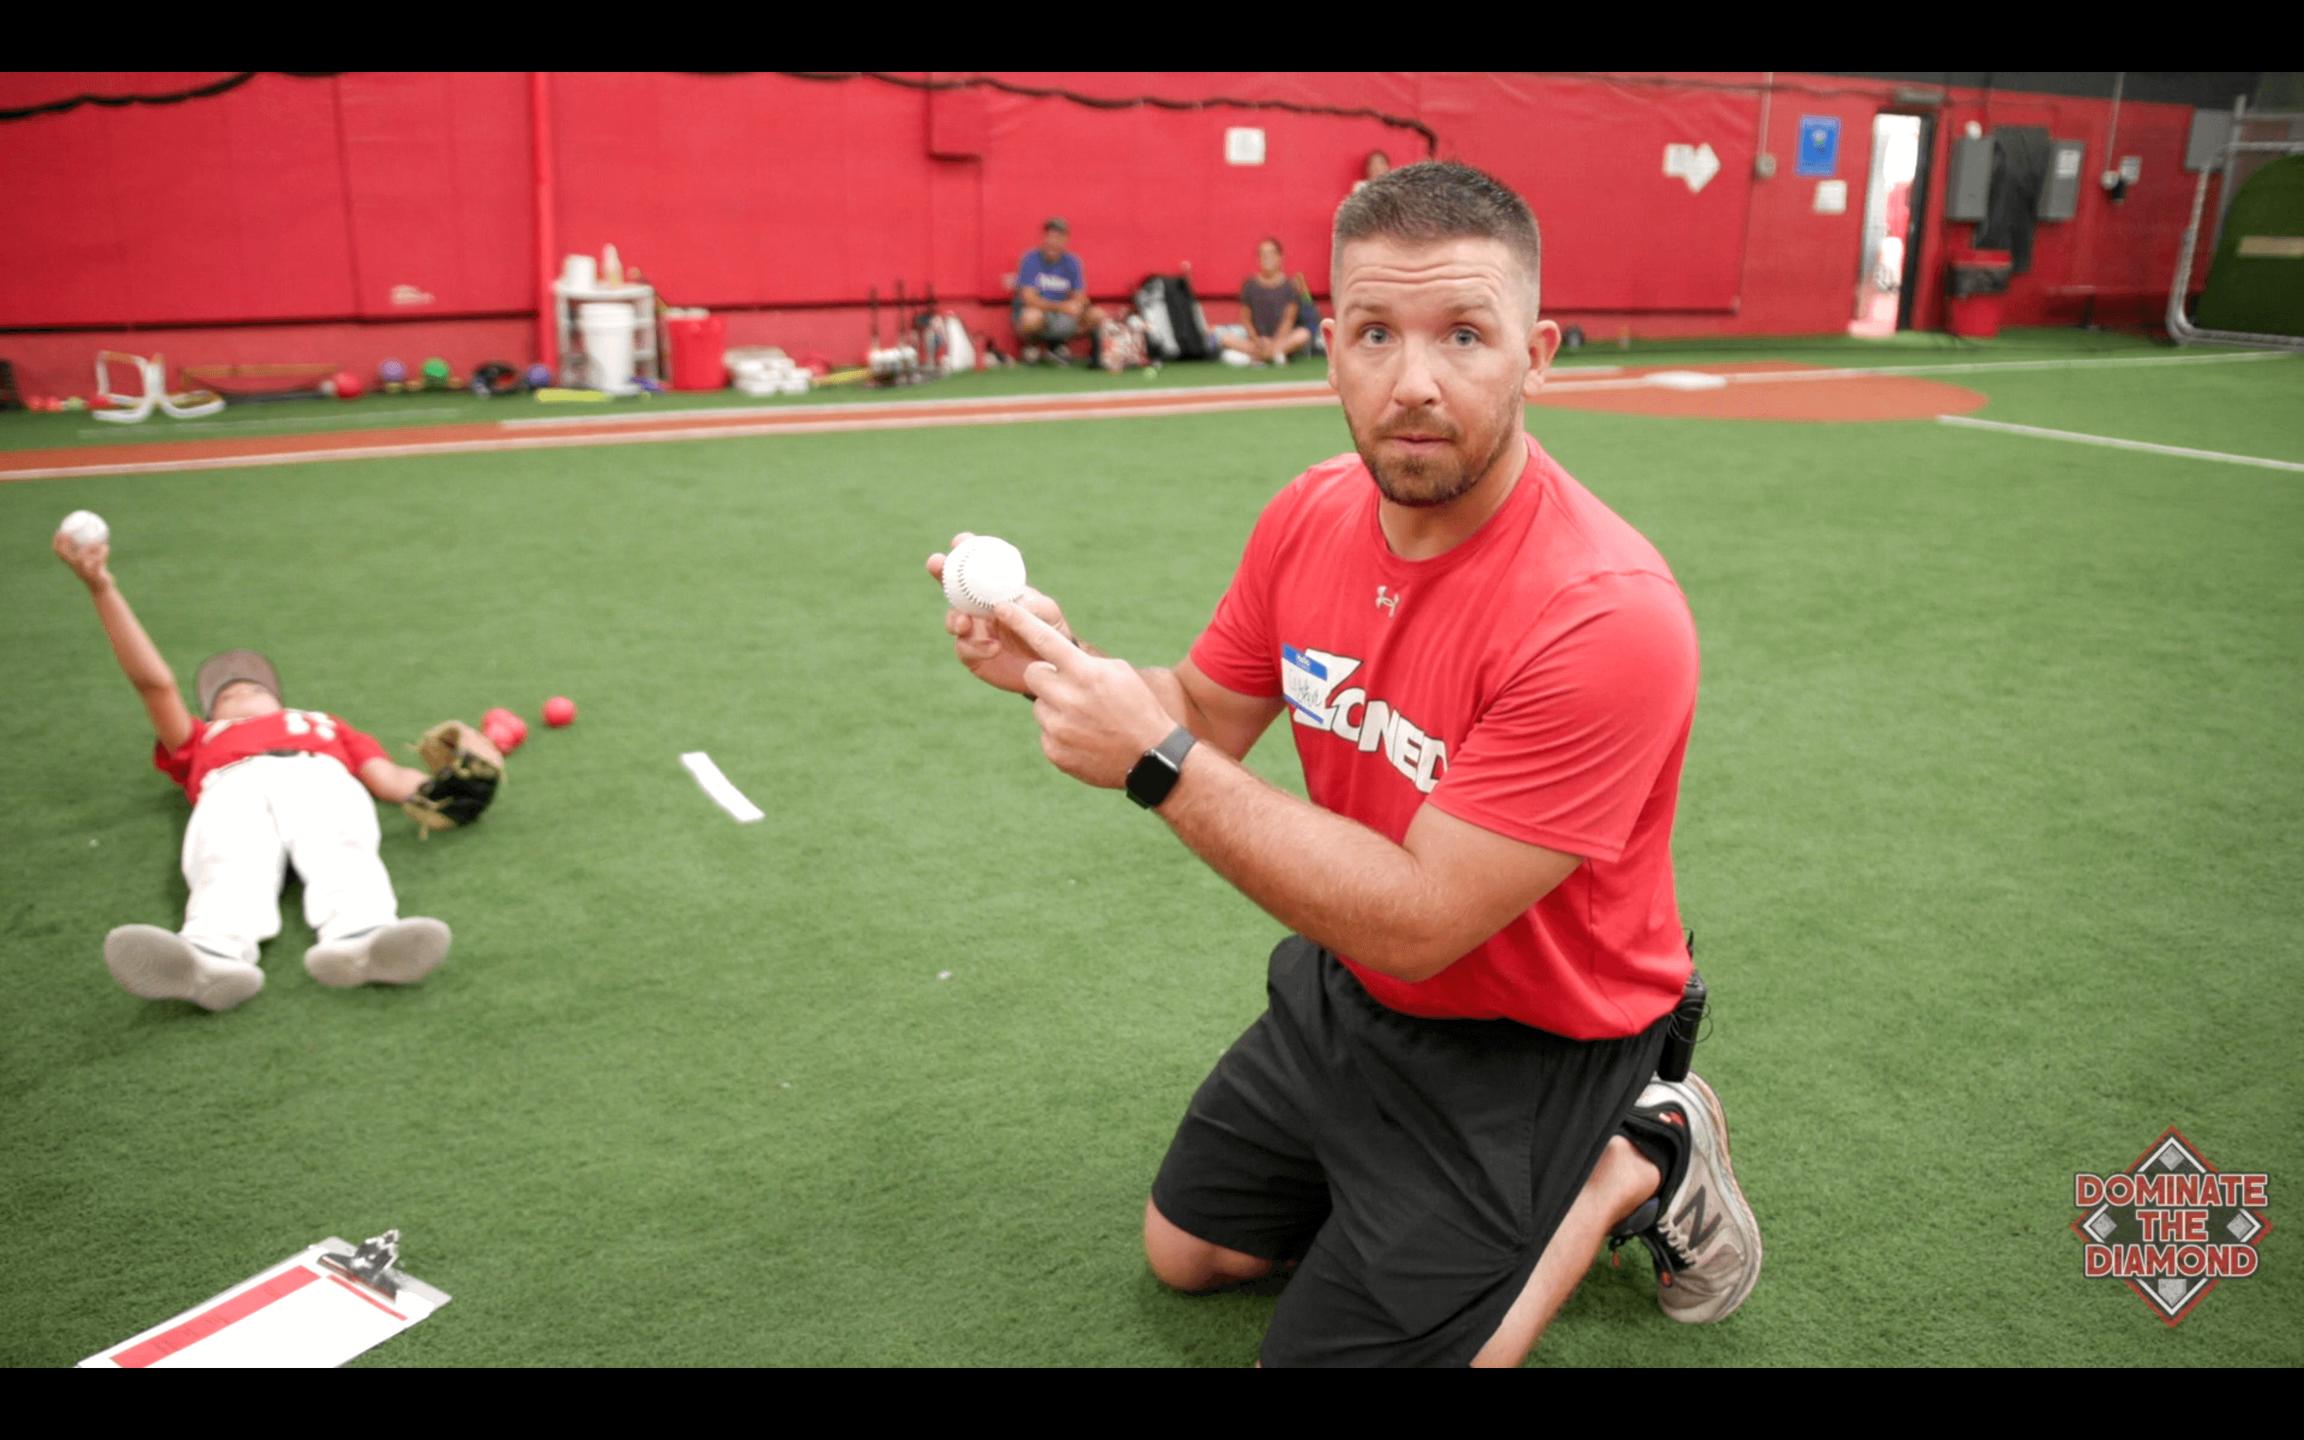 flick the ball rotation drill